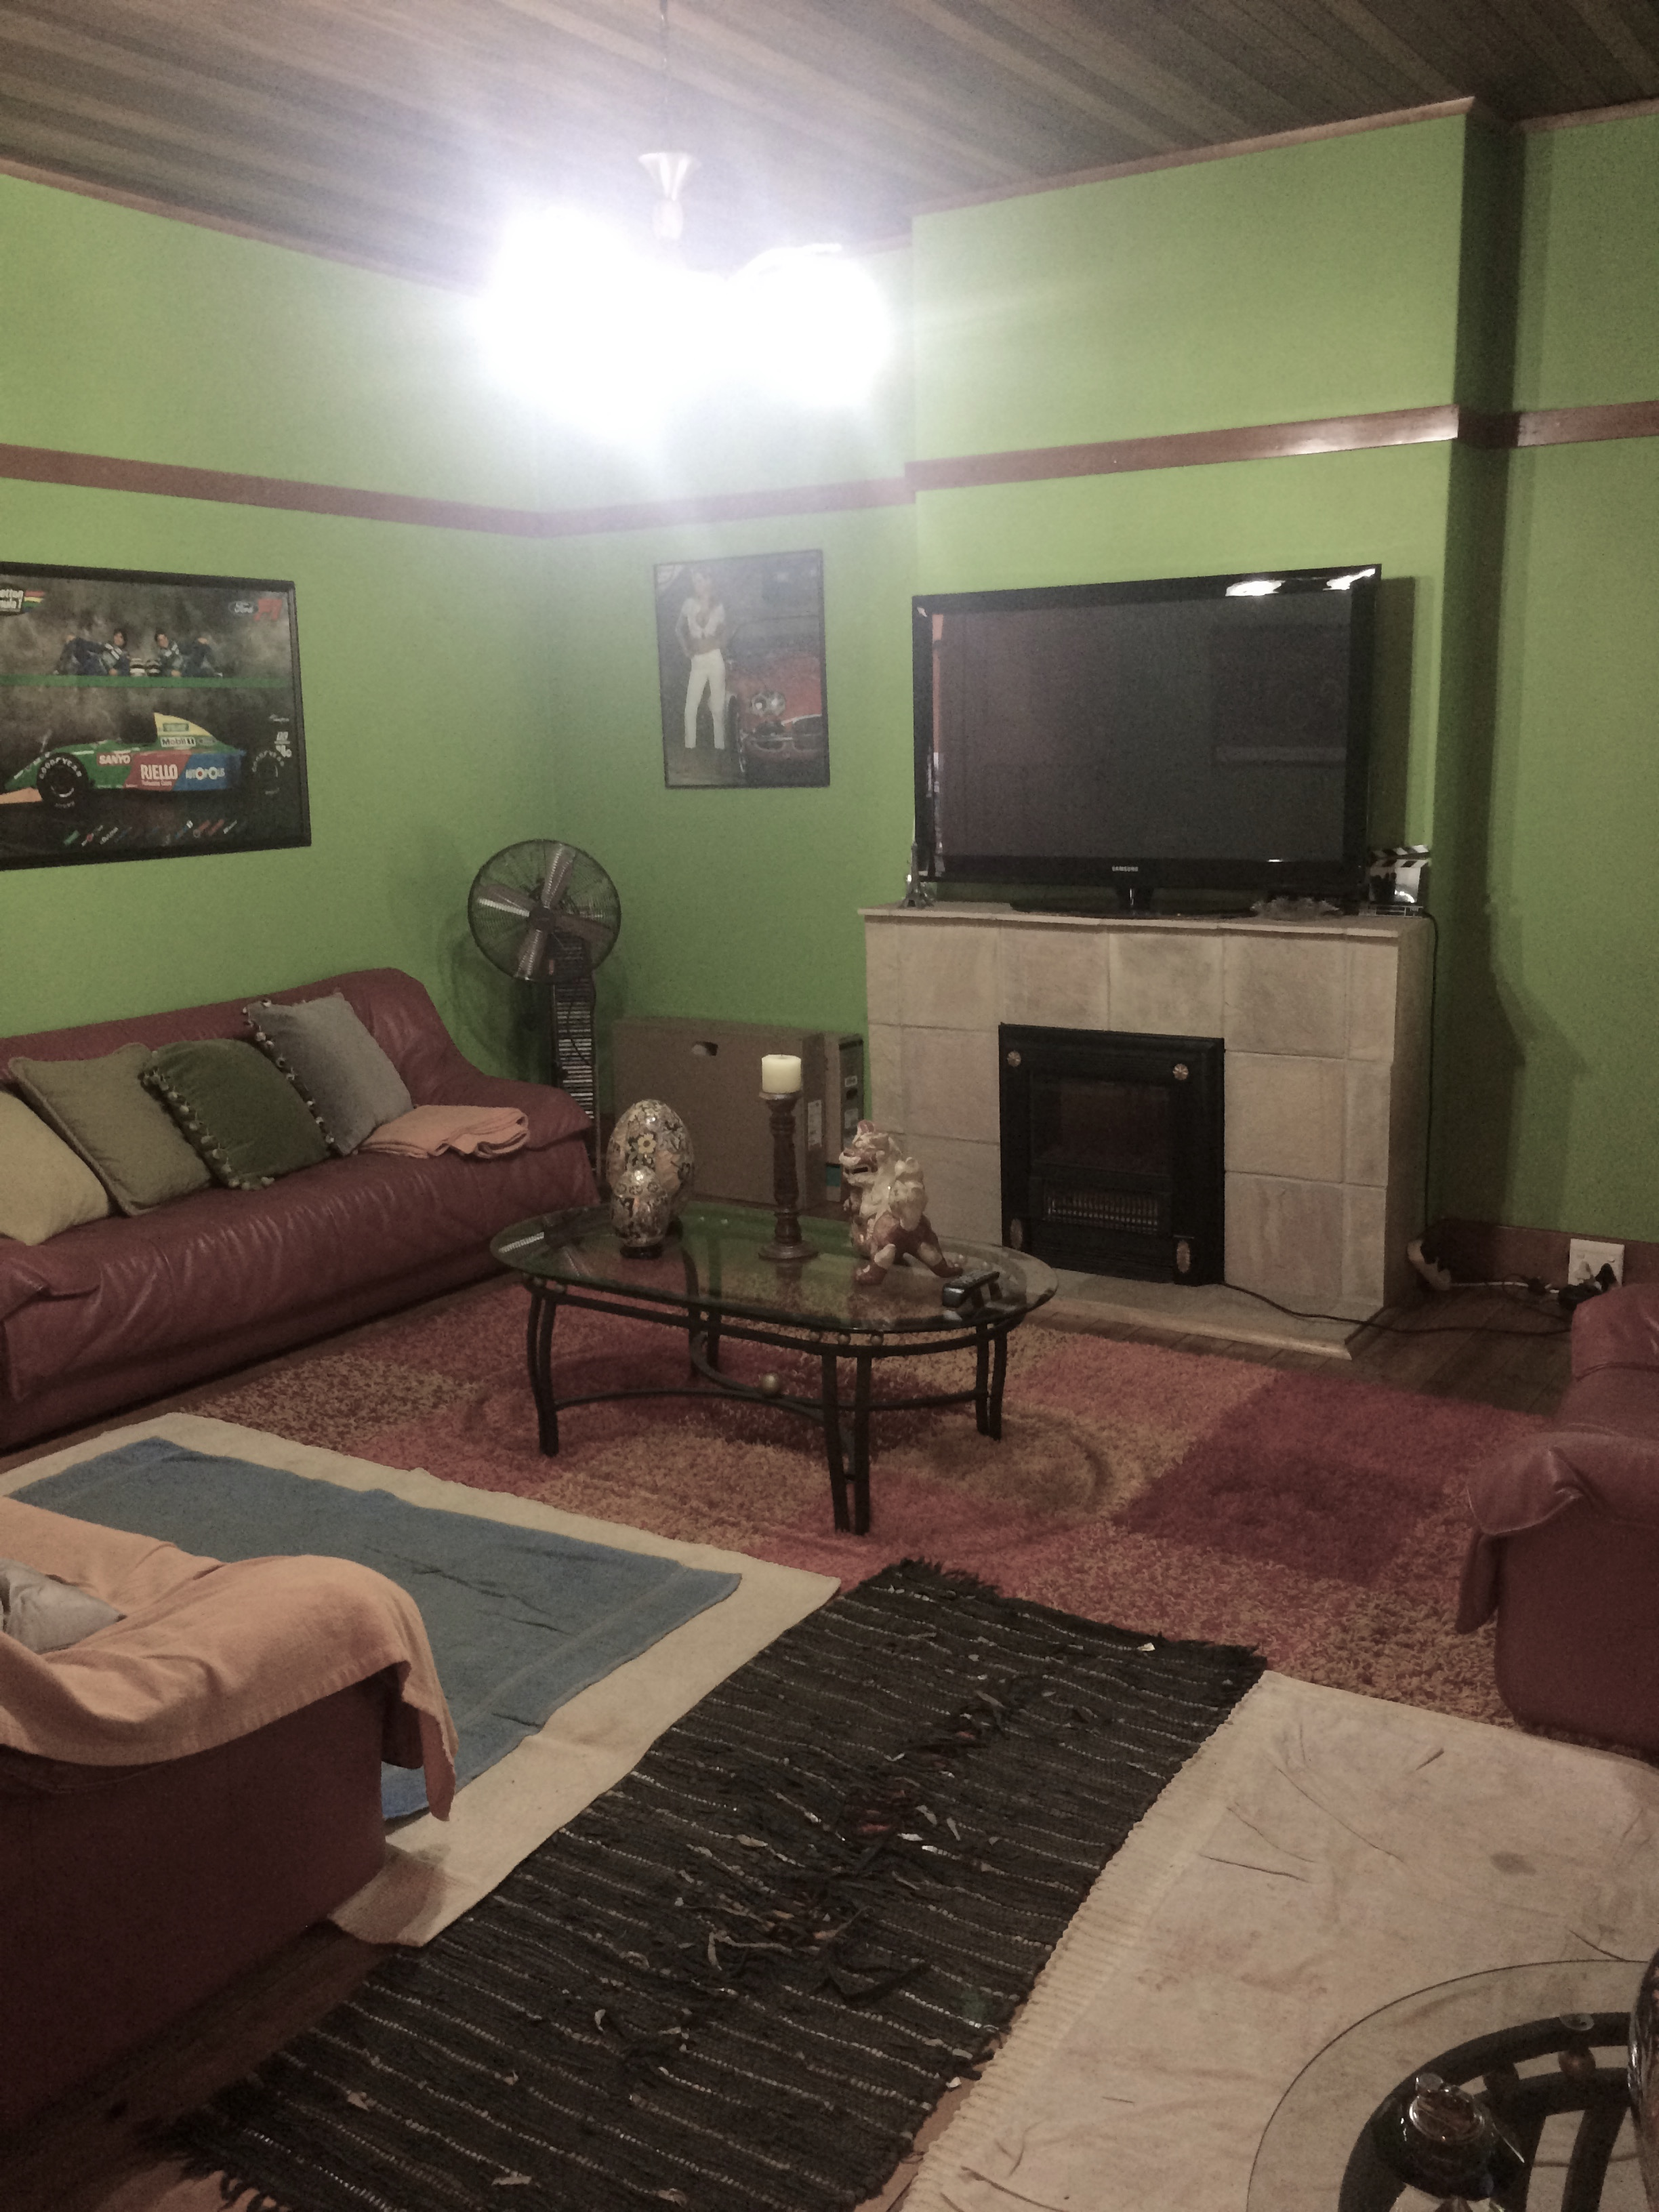 northumberland, South kensington Johannesburg, Gauteng, 6 Bedrooms Bedrooms, ,5 BathroomsBathrooms,House,For sale,northumberland,1029